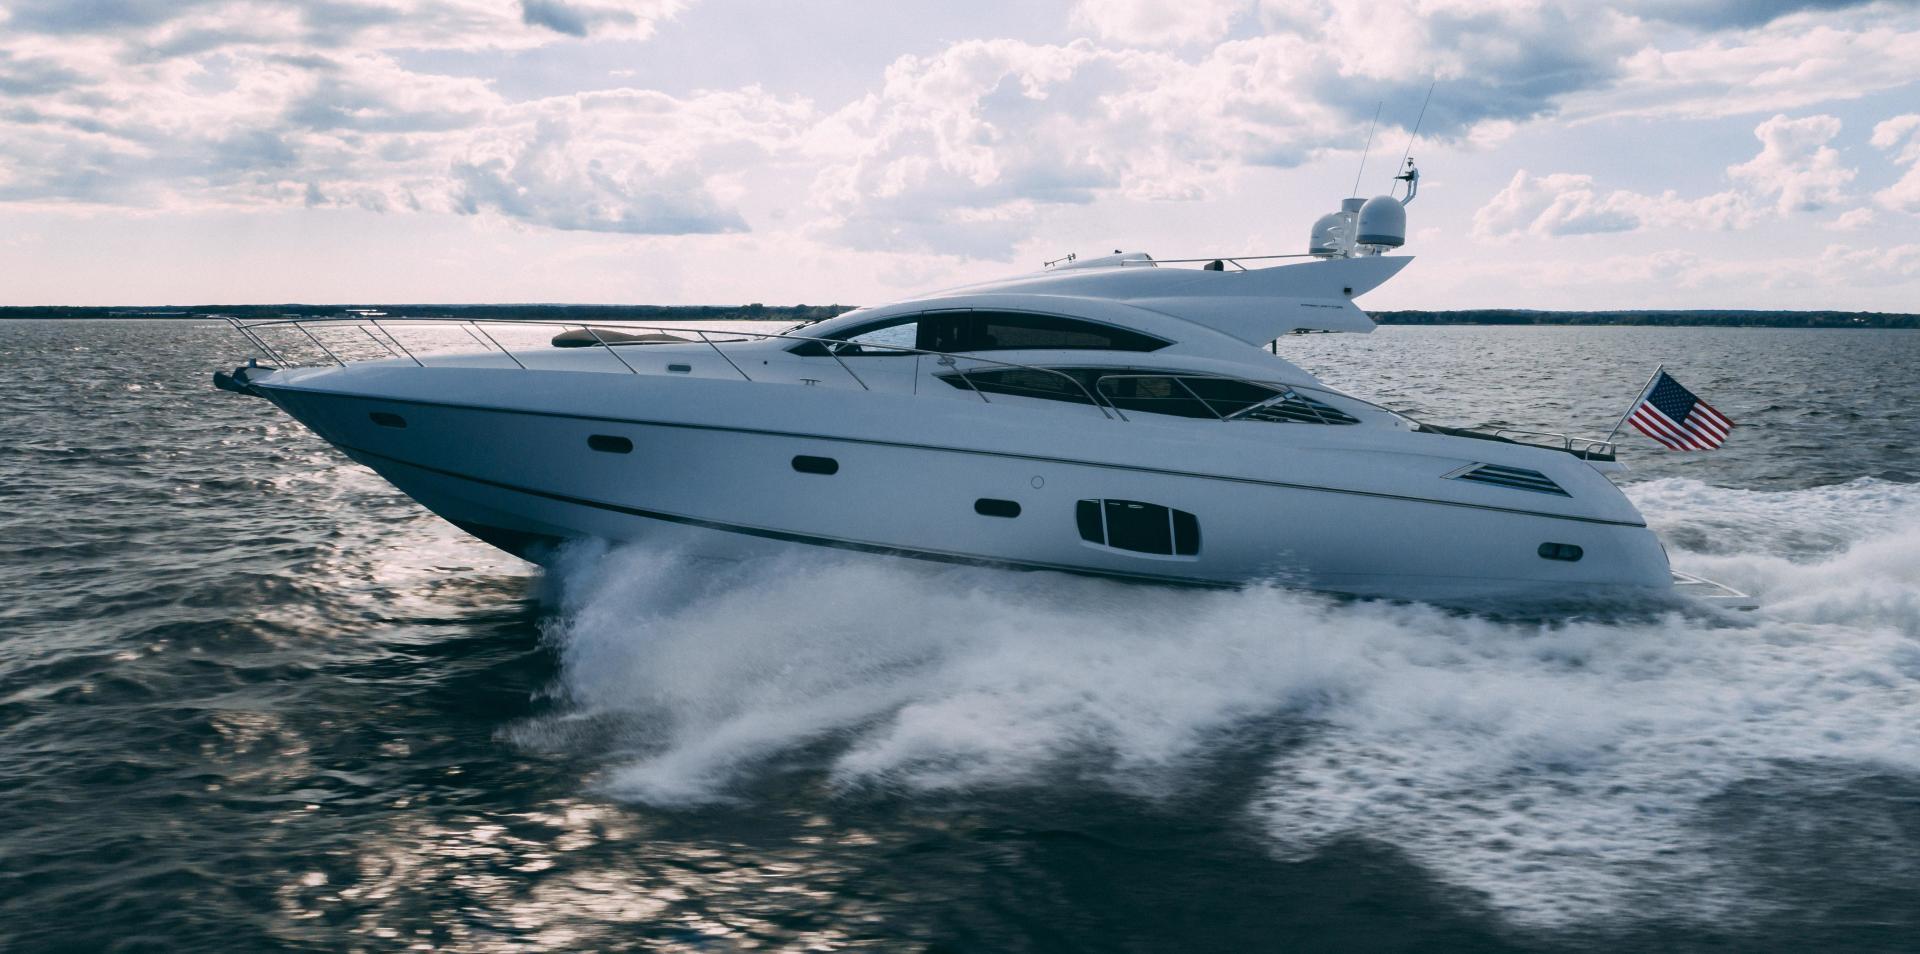 Sunseeker-Motor yacht 2012-JIMBO New Port-Rhode Island-United States-1480129 | Thumbnail